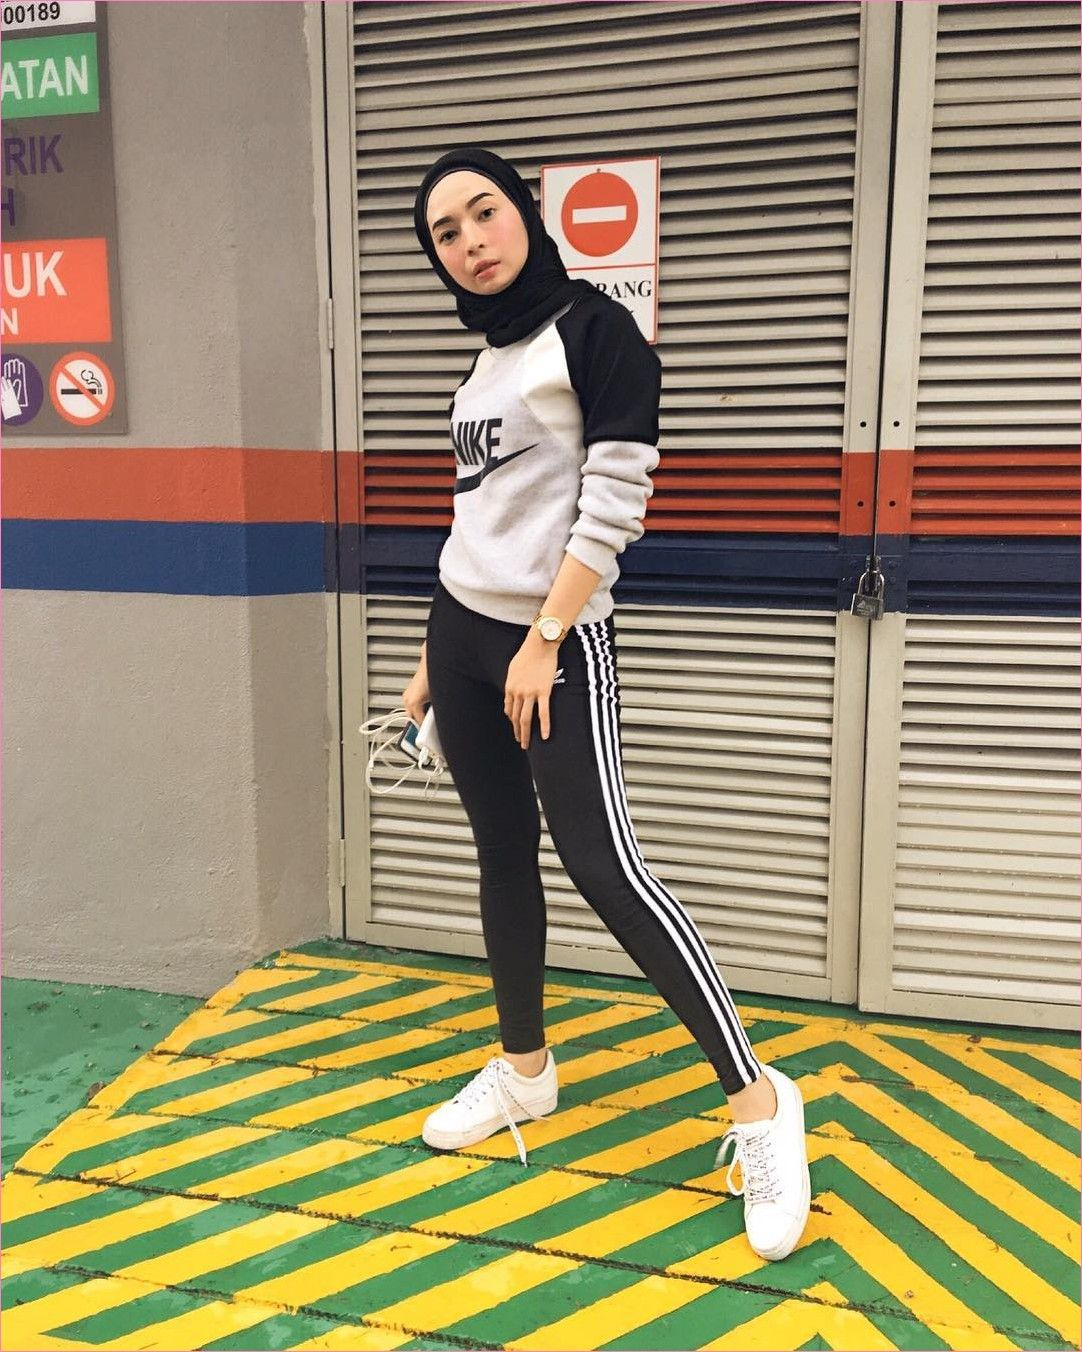 Outfit Baju Hijab Casual Untuk Olahraga Ala Selebgram 2018 Hijab Pashmina Jaket Sweater Legging Nike A Di 2020 Baju Olahraga Wanita Perlengkapan Hijab Pakaian Olahraga